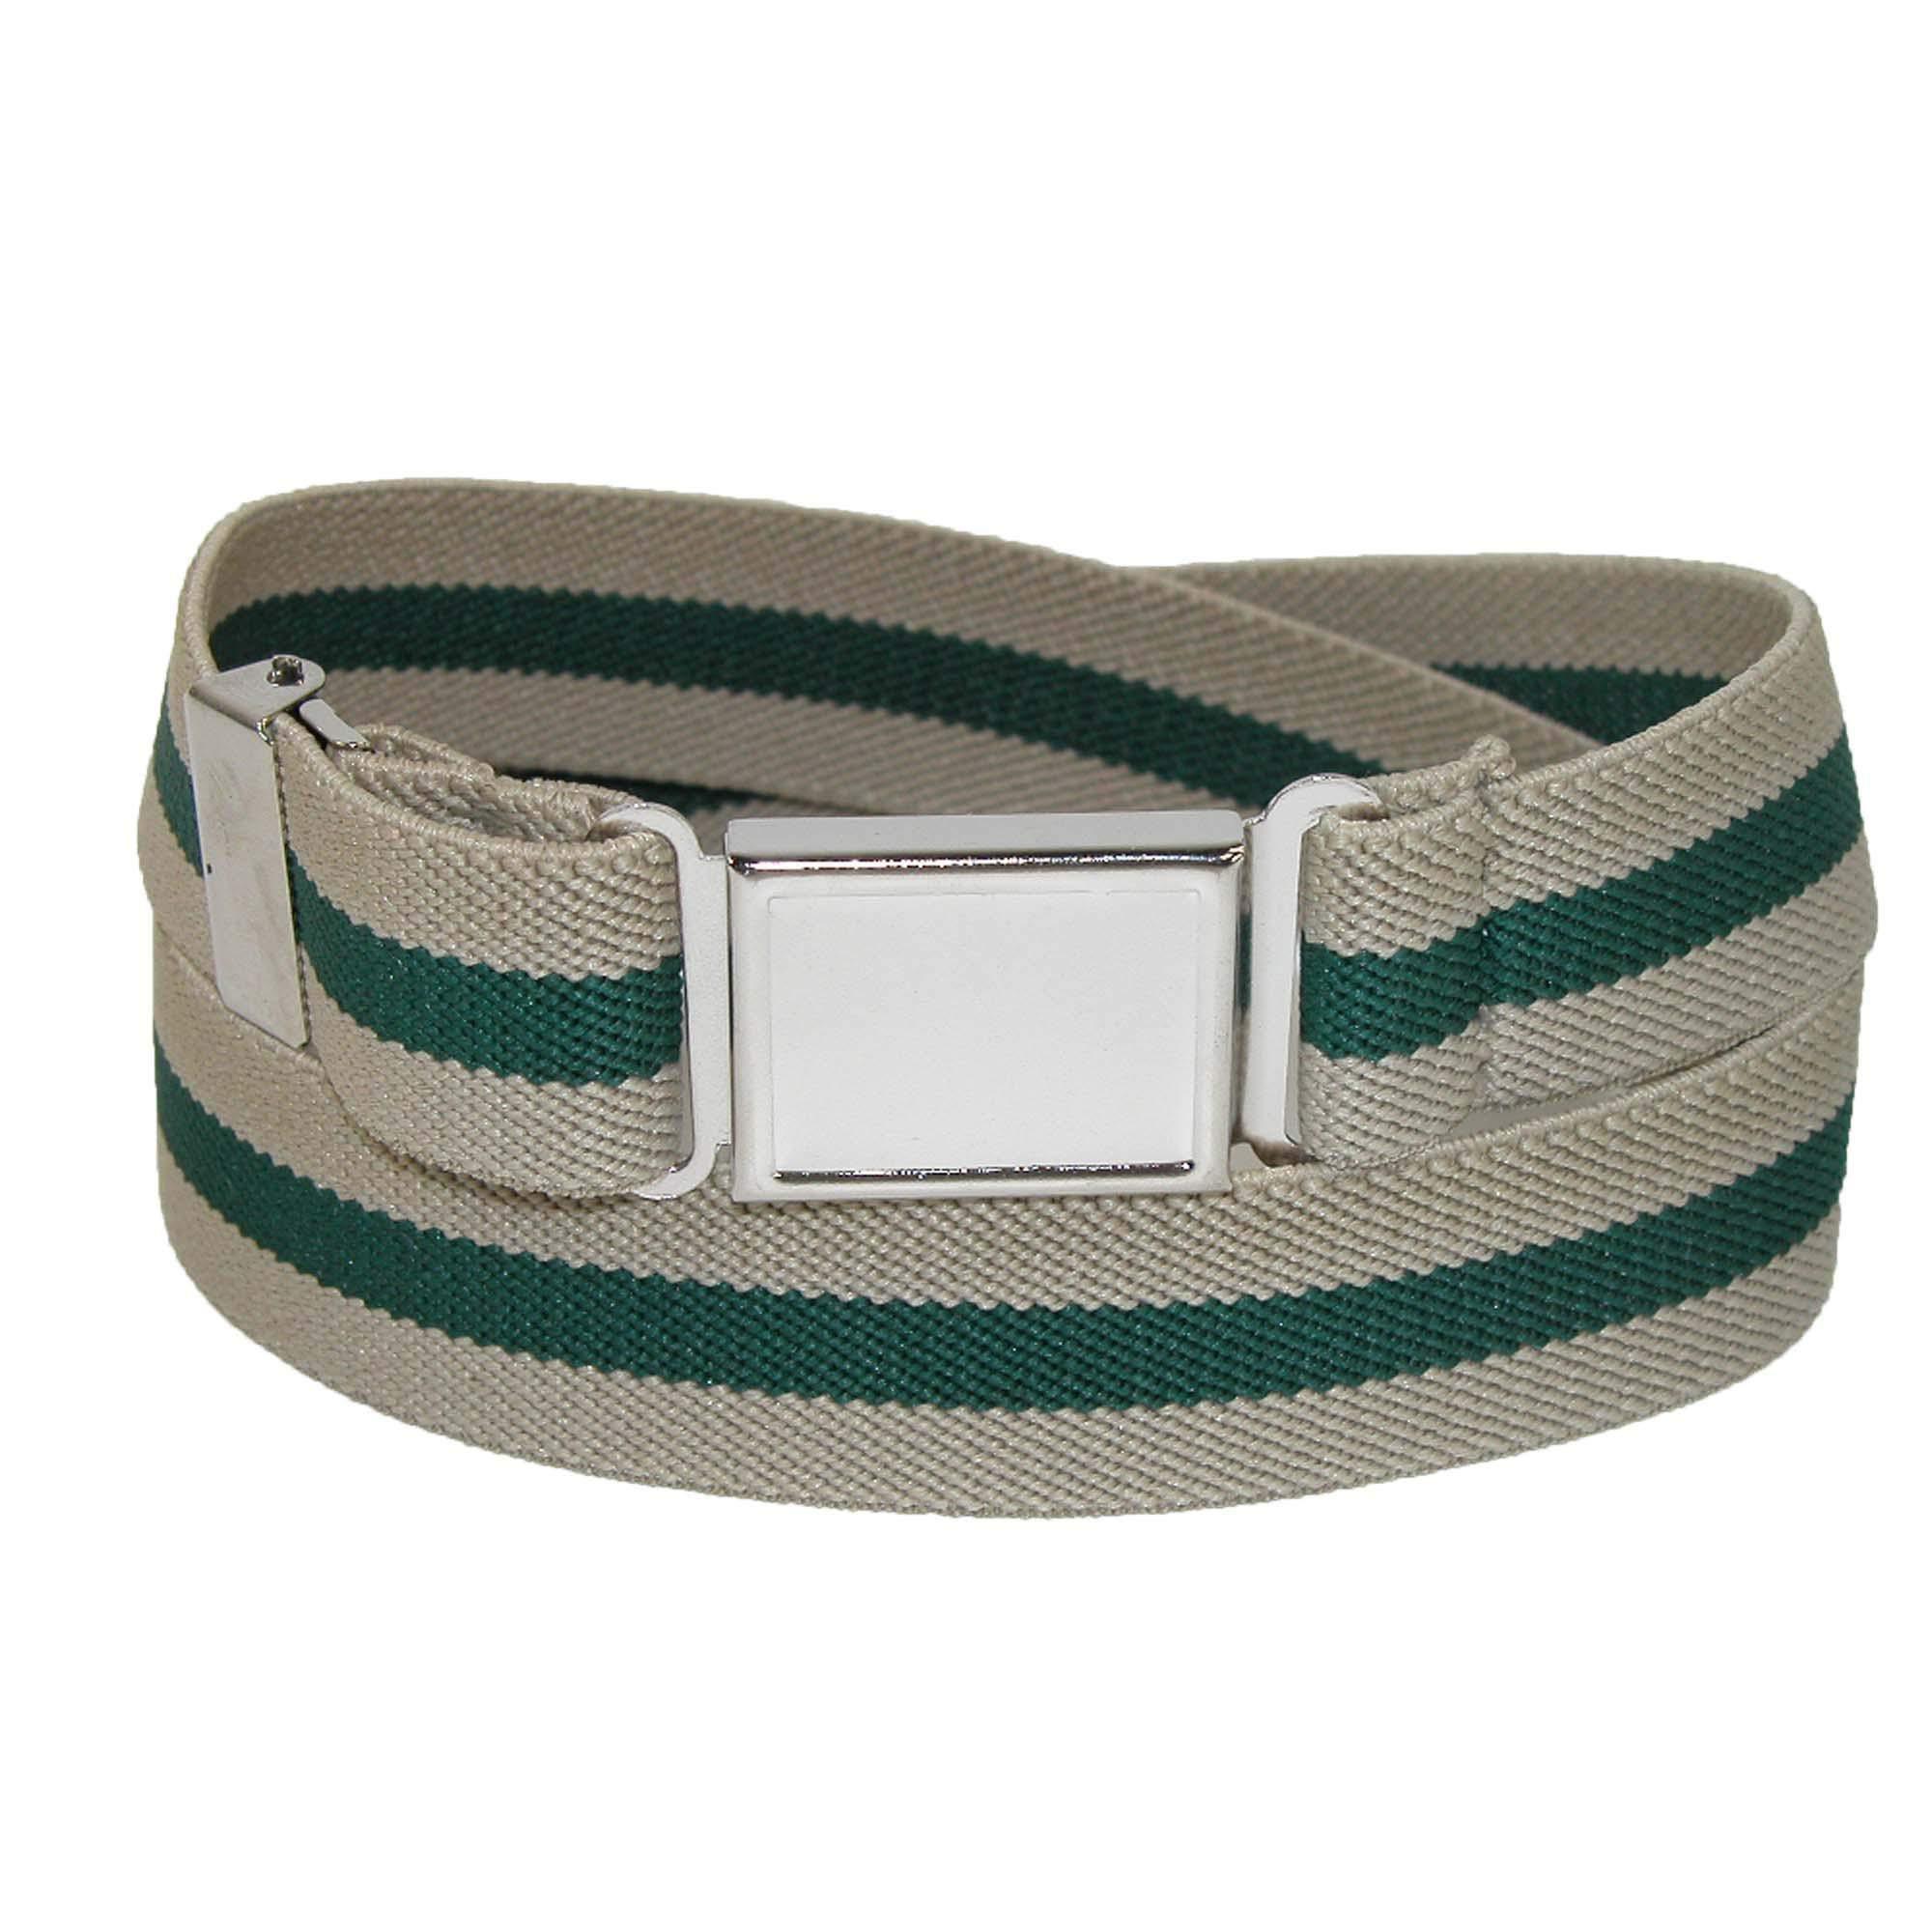 CTM Kids' Elastic Striped Belt with Magnetic Buckle, Khaki/Hunter/Khaki